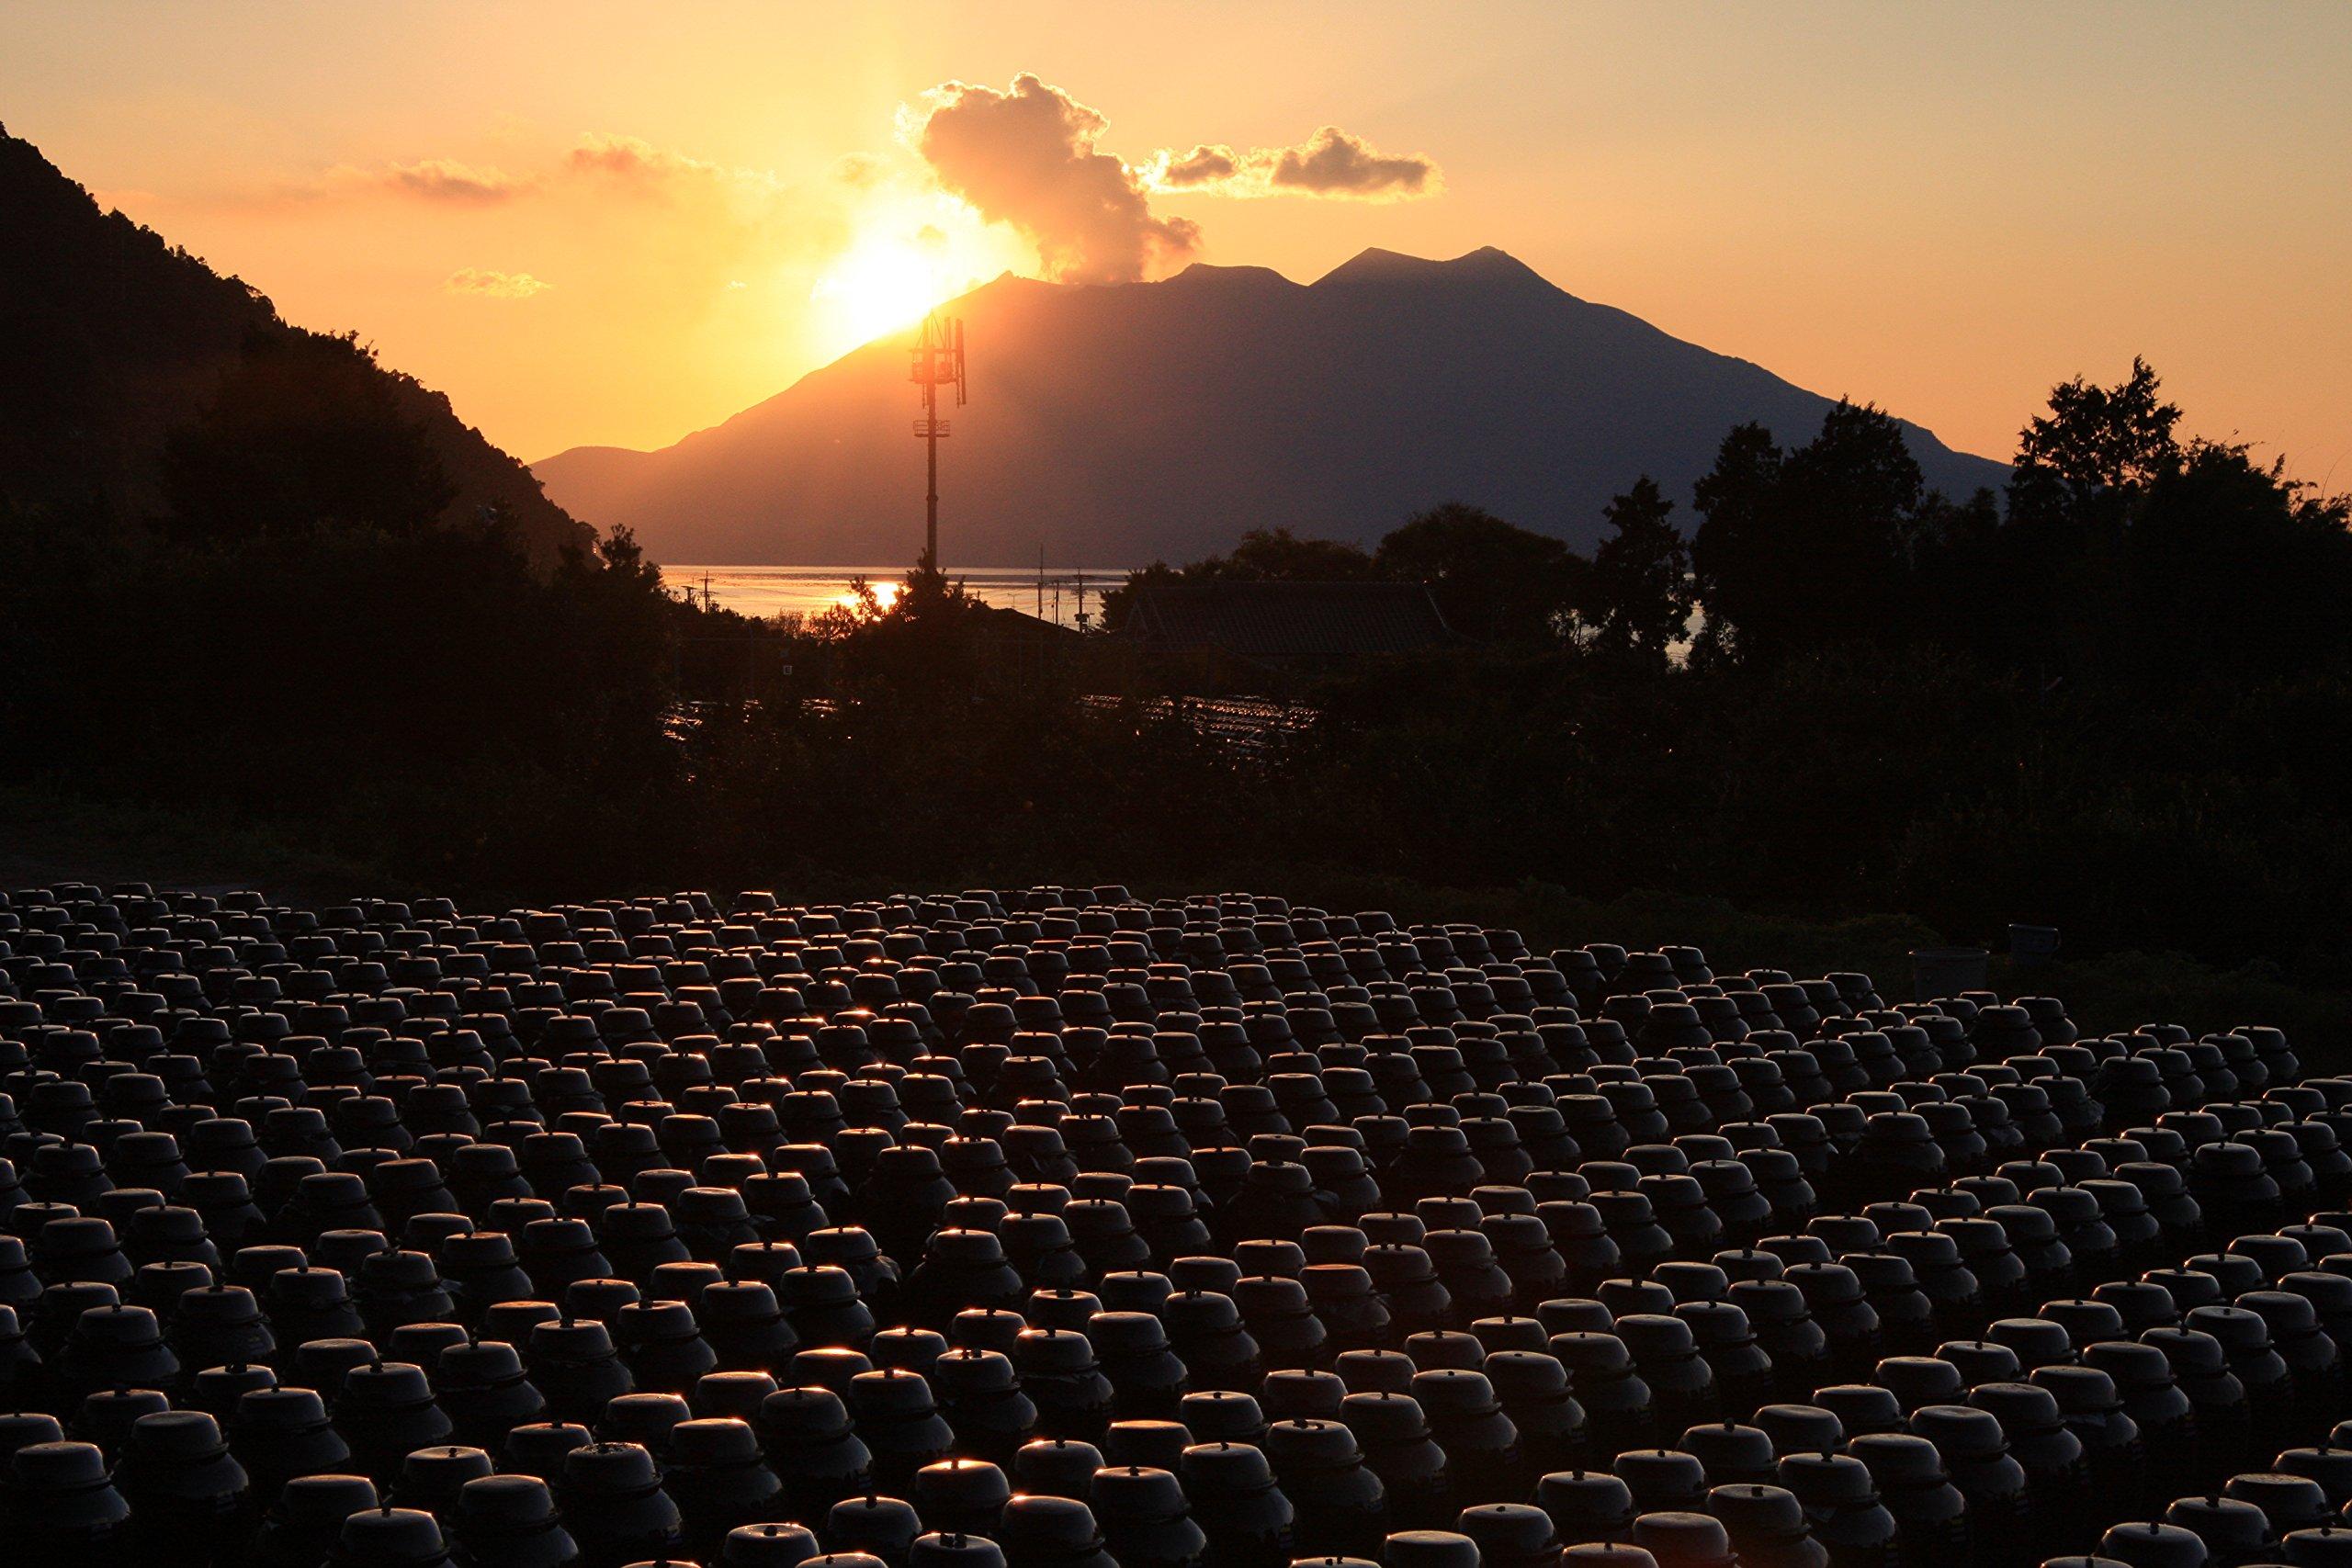 KAKUIDA Premium Brown Rice Black Vinegar Aged 10 years 33.8 Fl, Oz (1000 Ml) by Kakuida